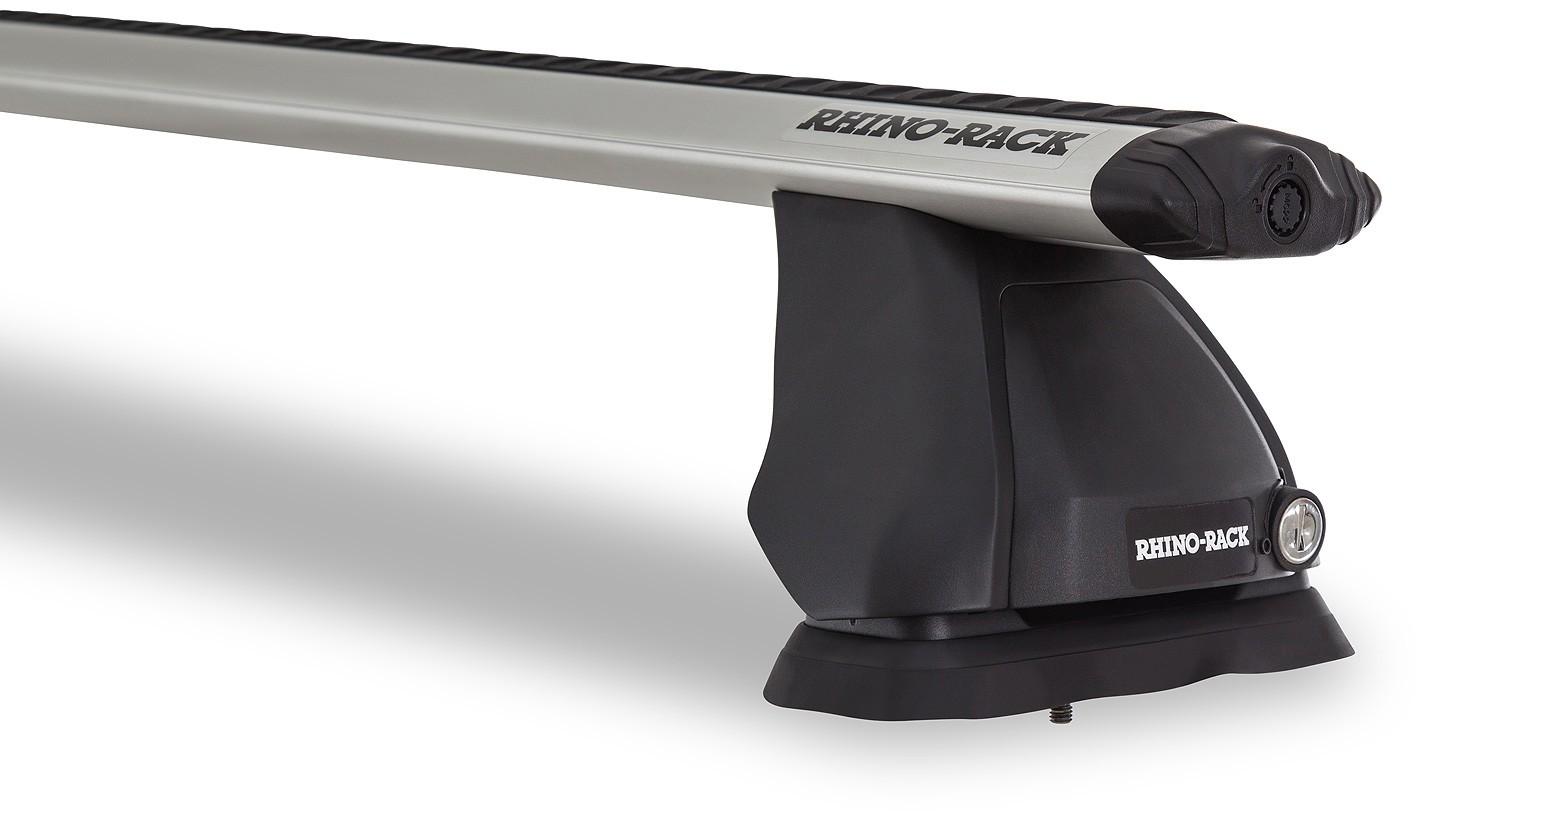 Rhino-Rack Vortex 2500 Ditch Mount 2 Bar Roof Rack